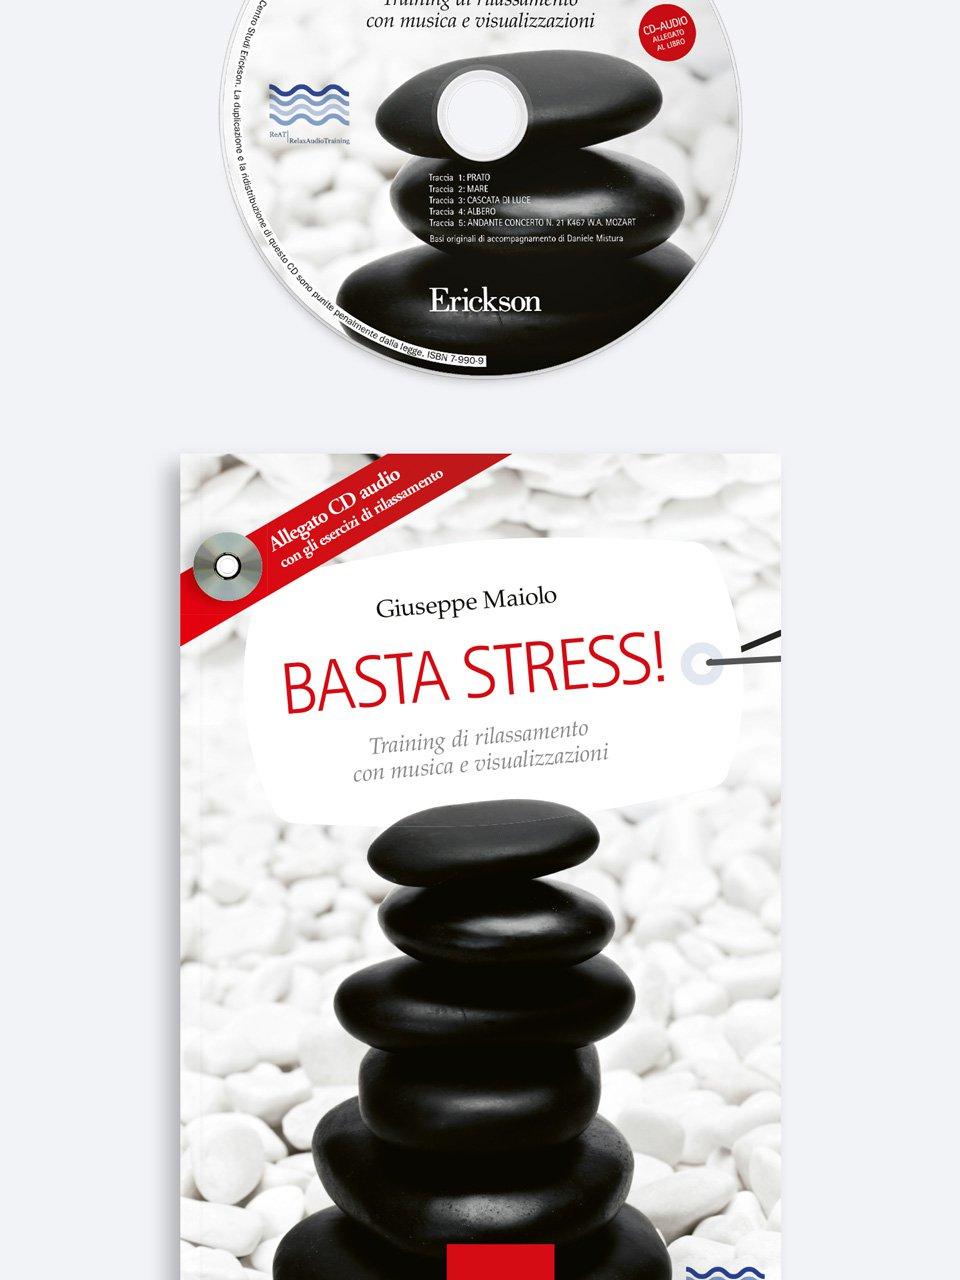 Basta stress! - Self-help: libri sull'auto aiuto - Erickson